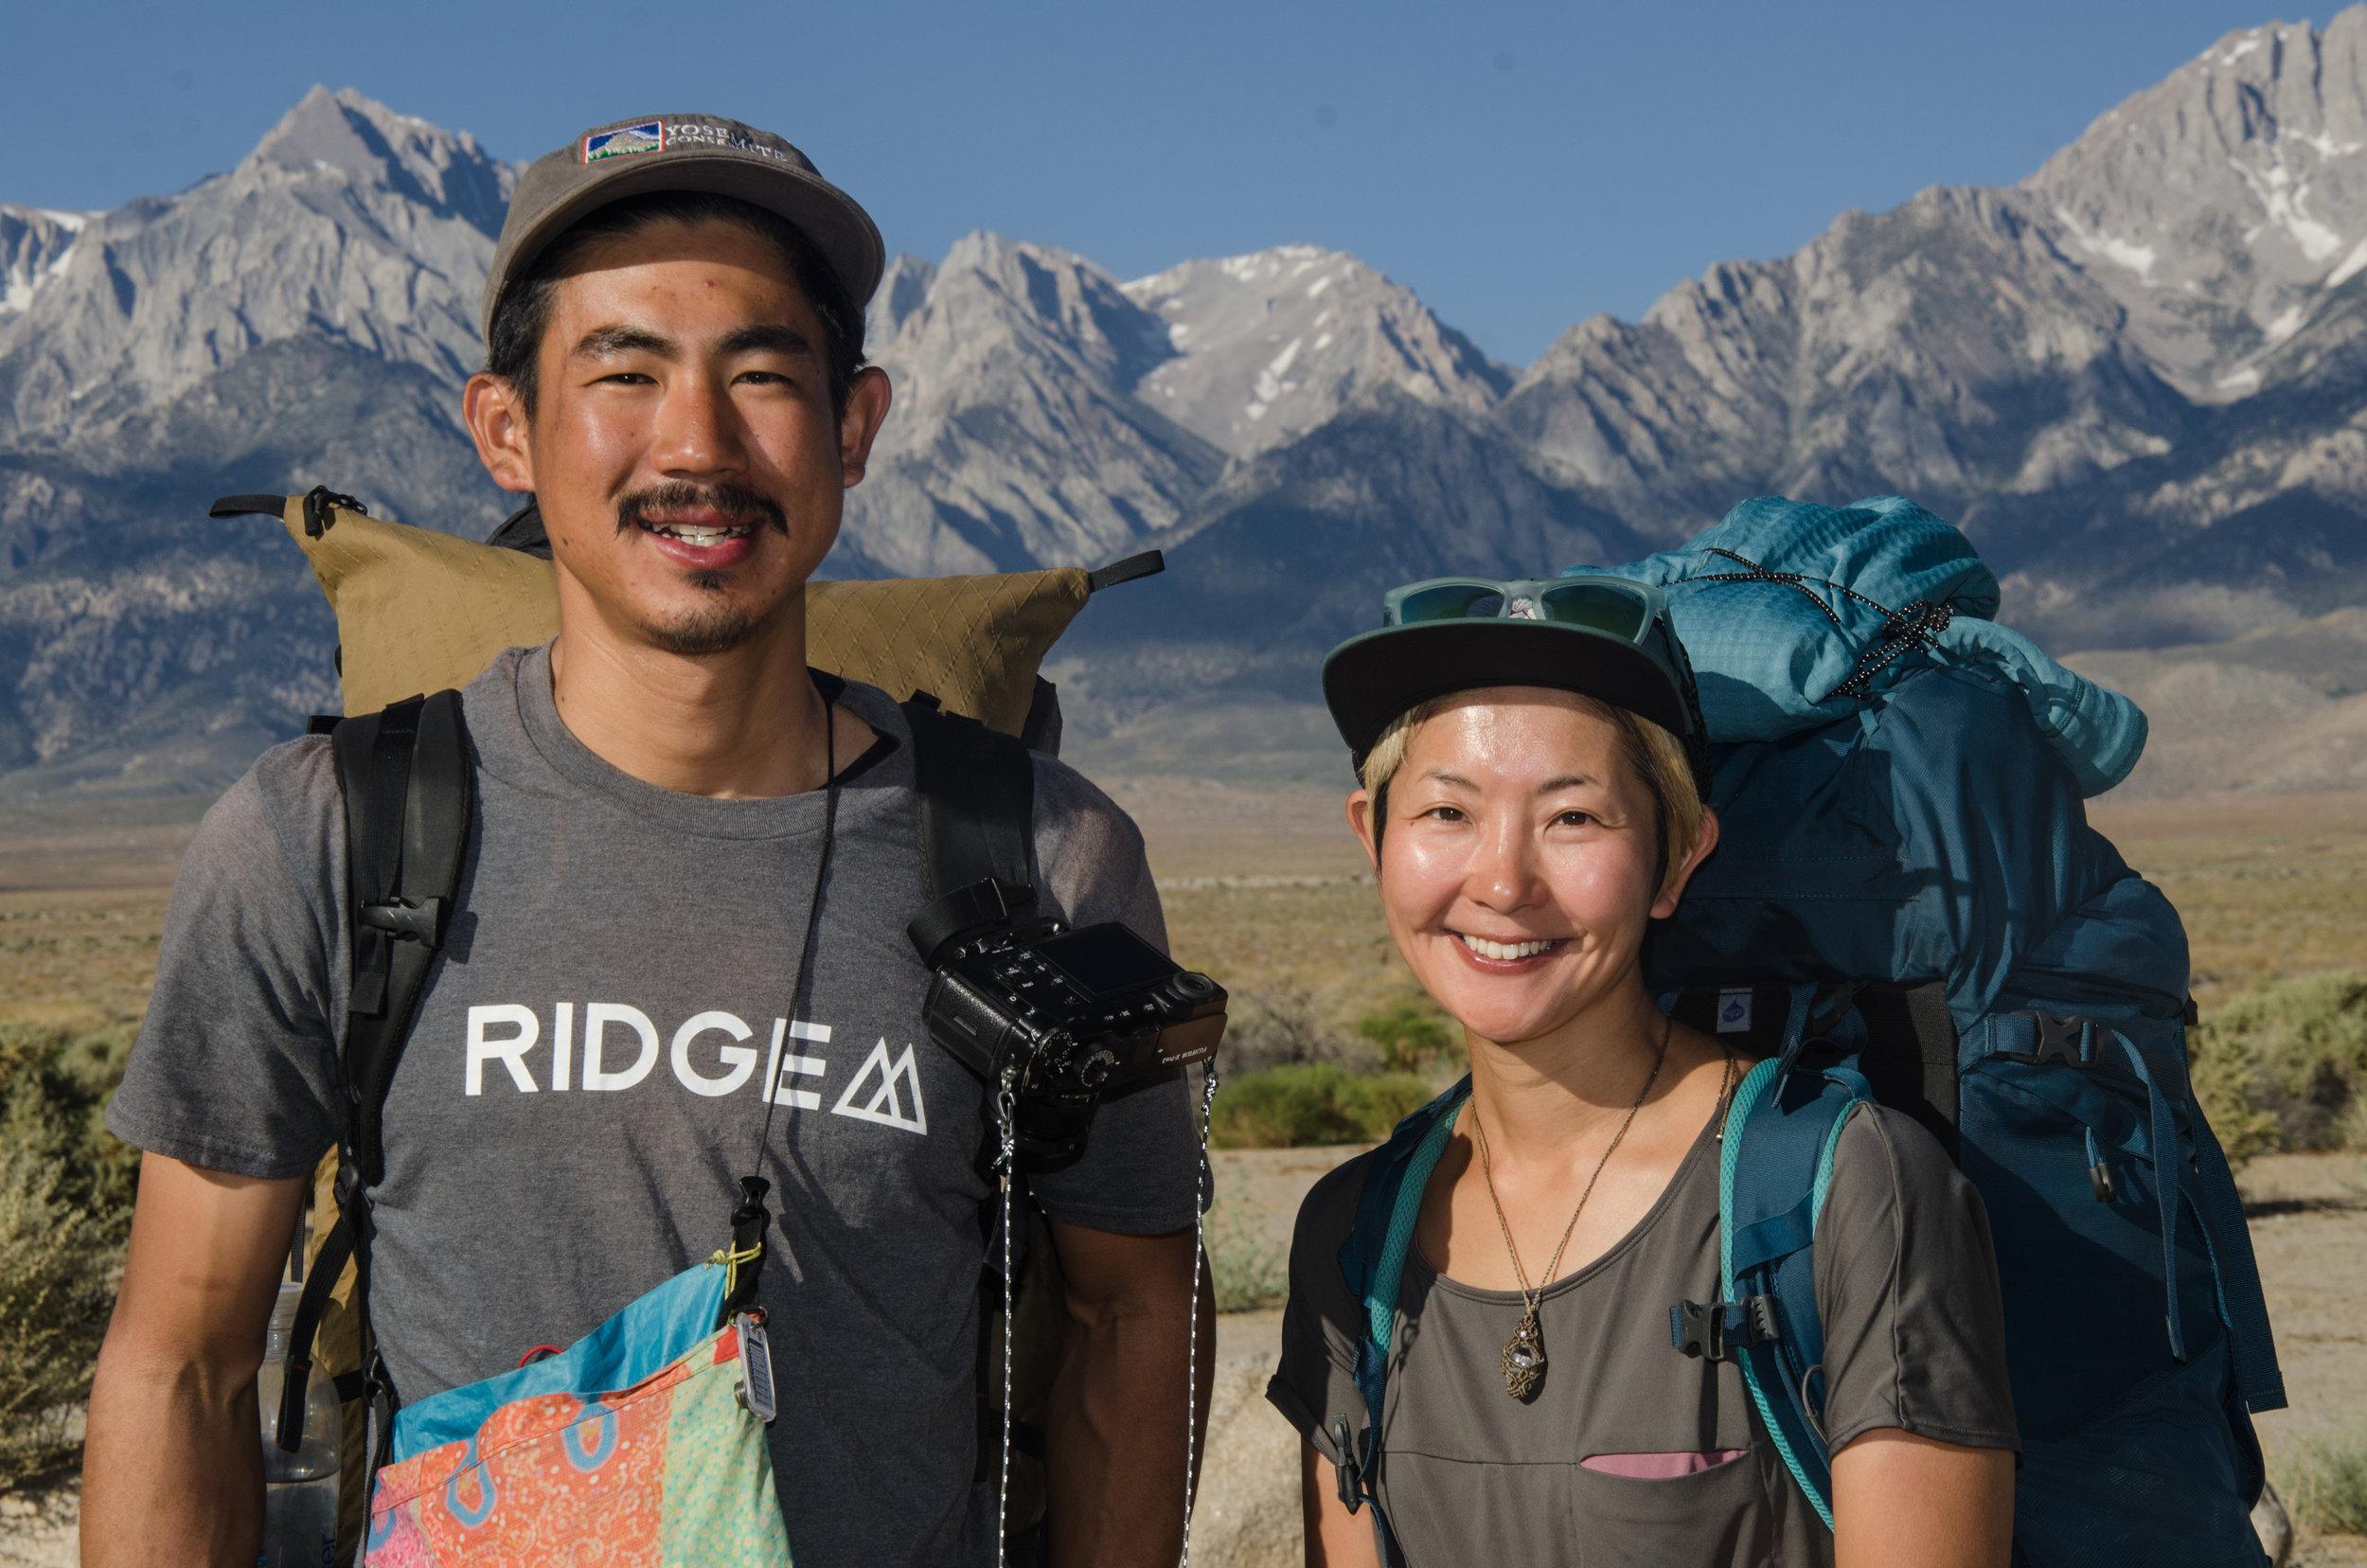 JMT hikers from Japan Riku and Arisa